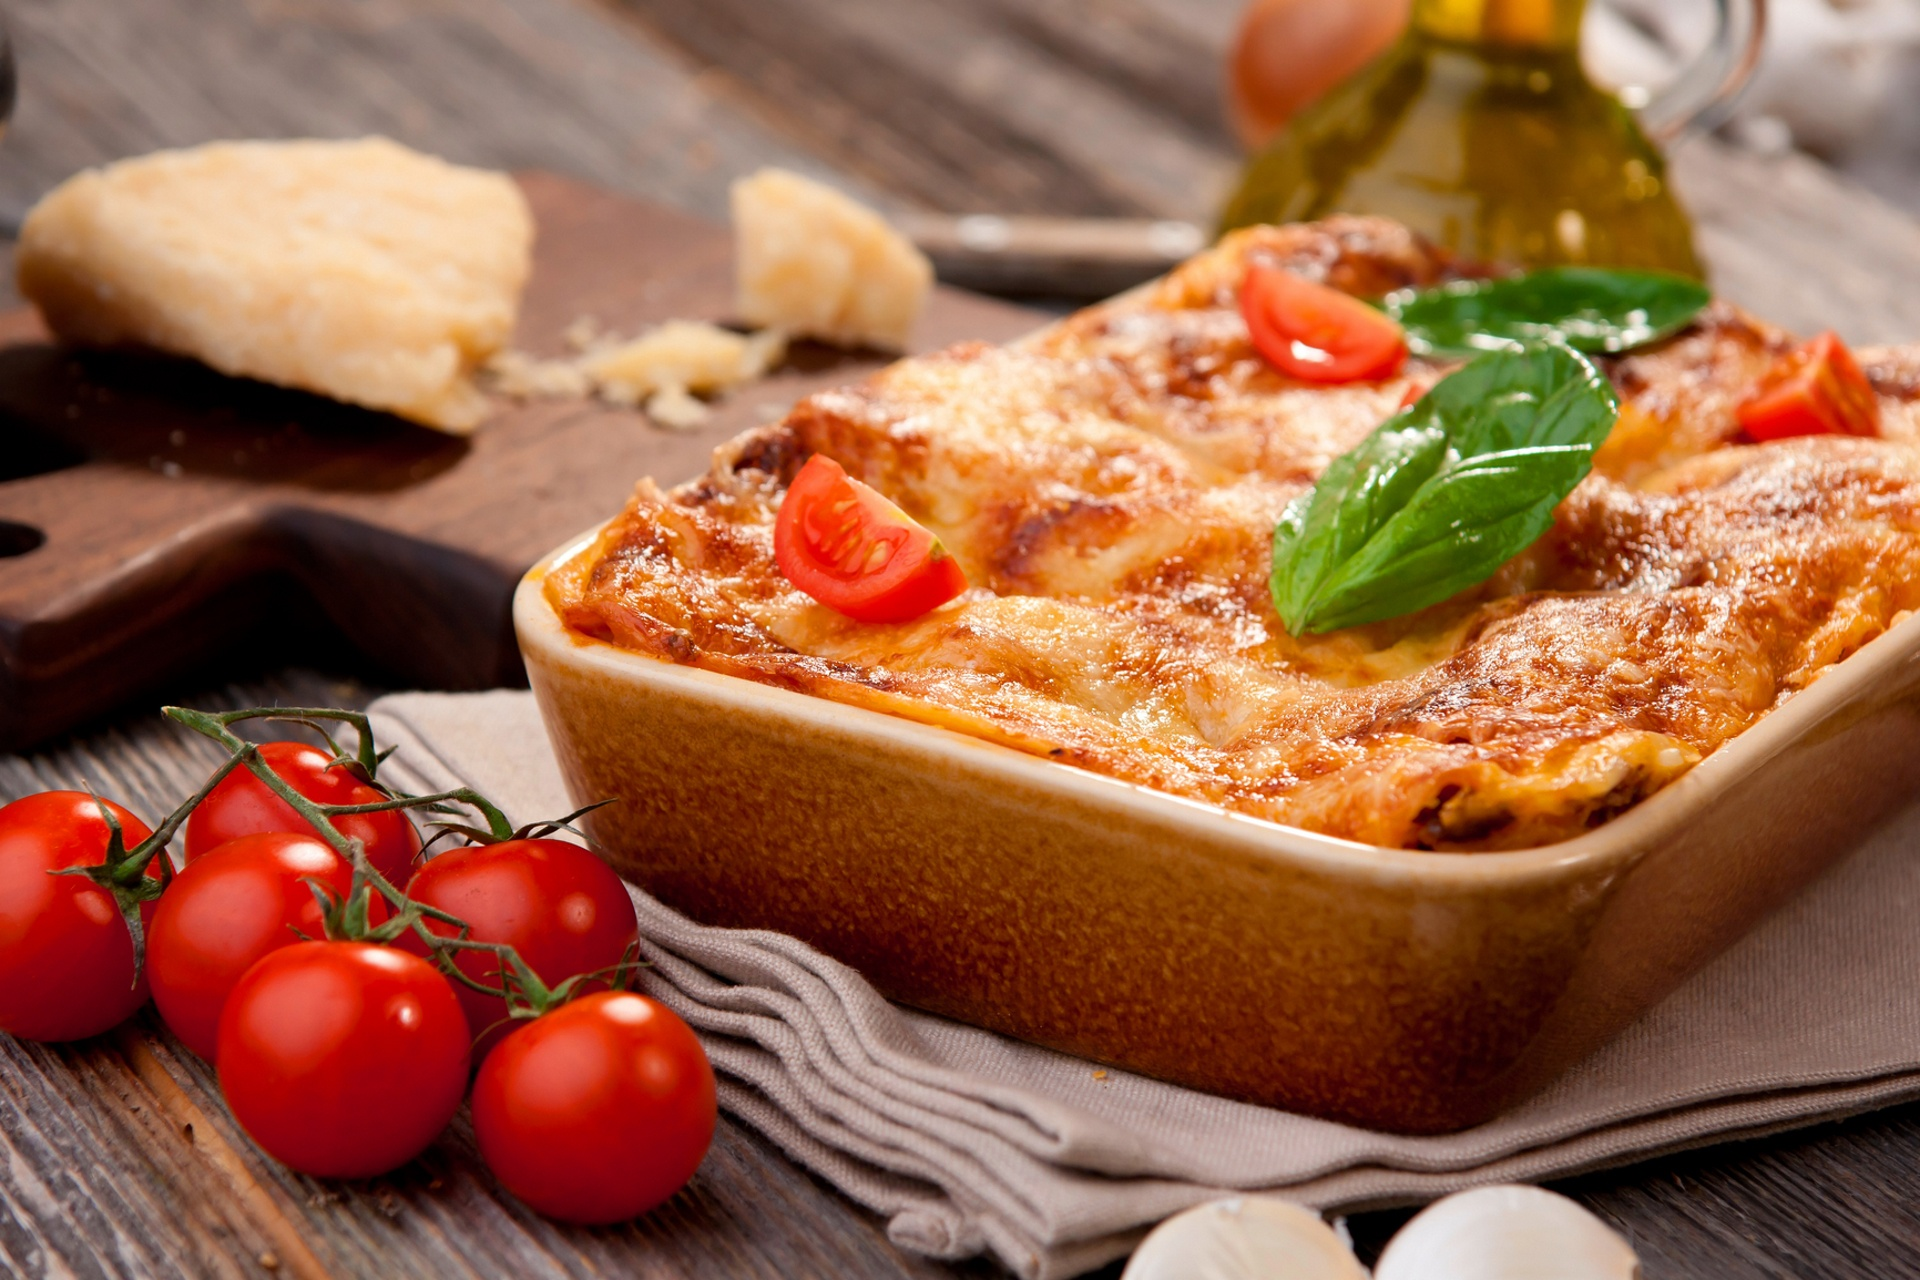 Lasagna Pasta Still Life Tomato 1920x1280